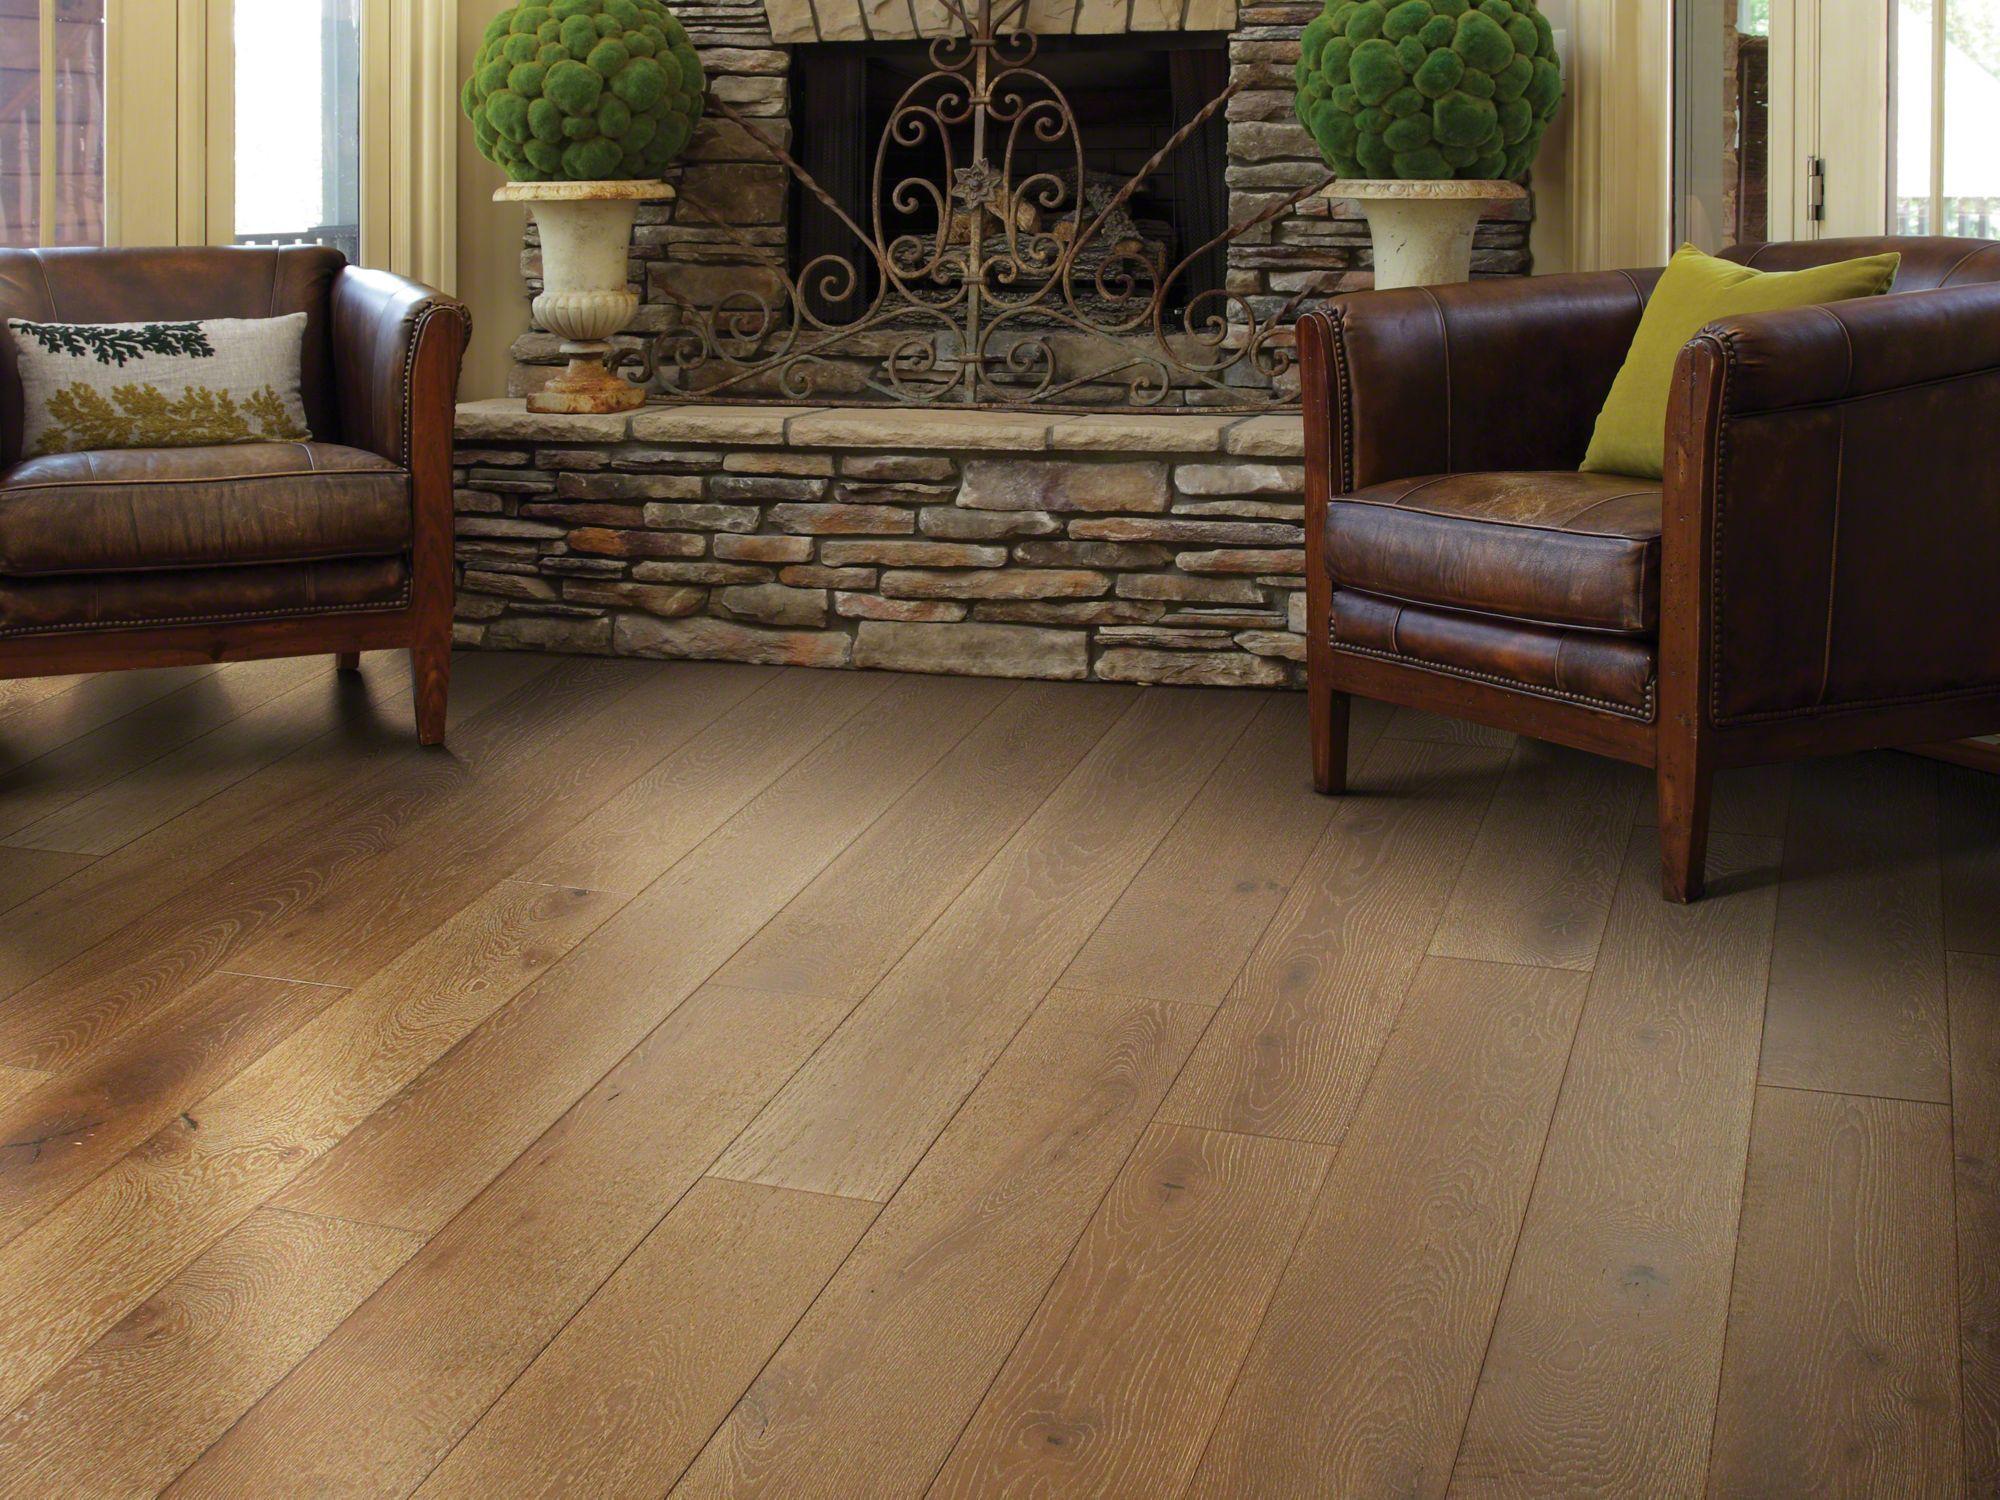 Hardwood flooring flooring how toswid 1020 katy rich for Shaw hardwood flooring